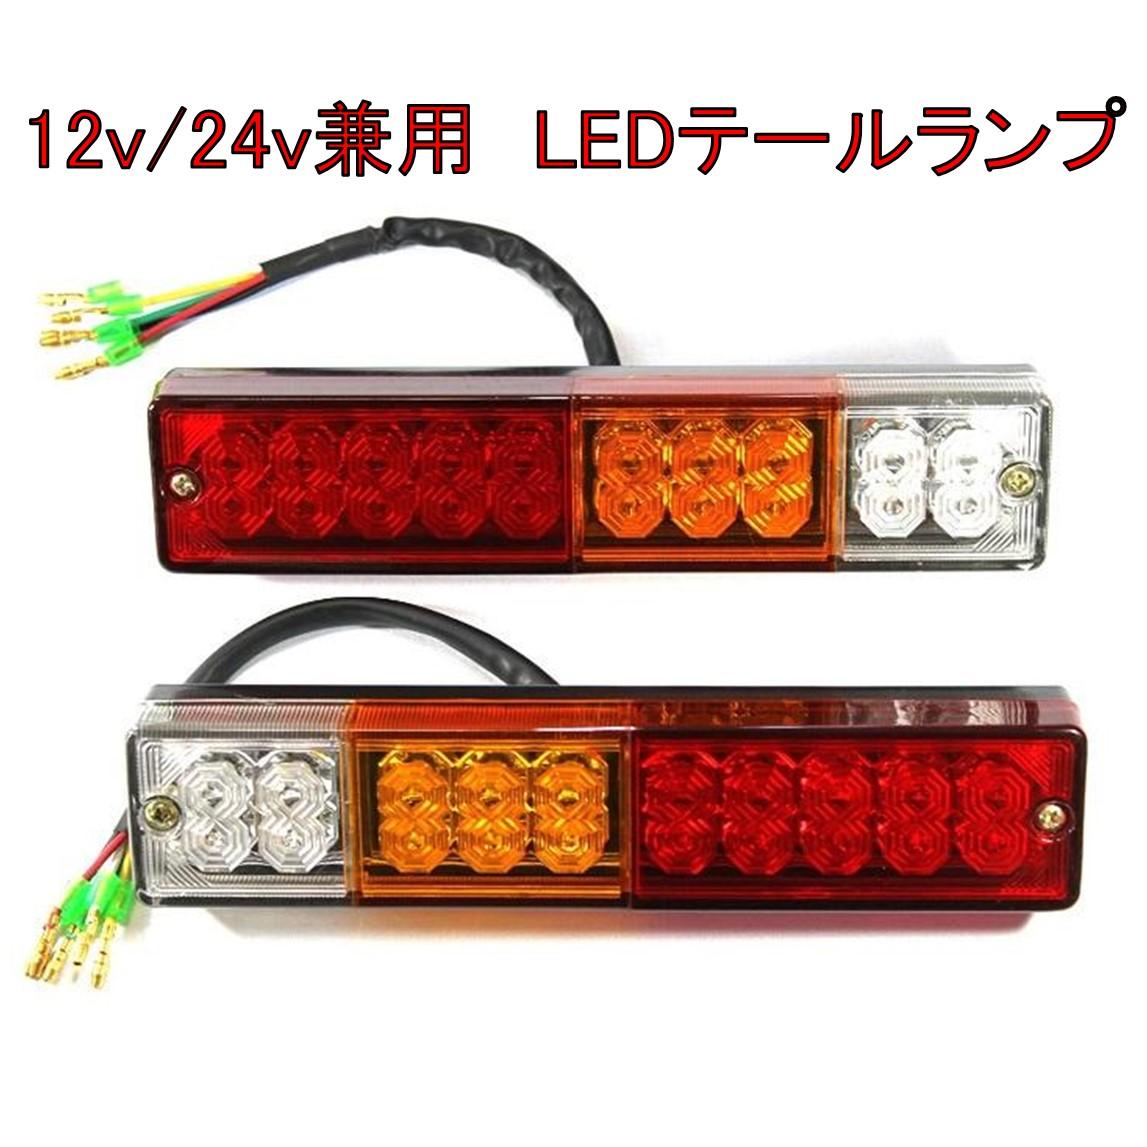 LEDテールランプ 12v 24v NEW 販売期間 限定のお得なタイムセール ARRIVAL 2個セット トレーラー等